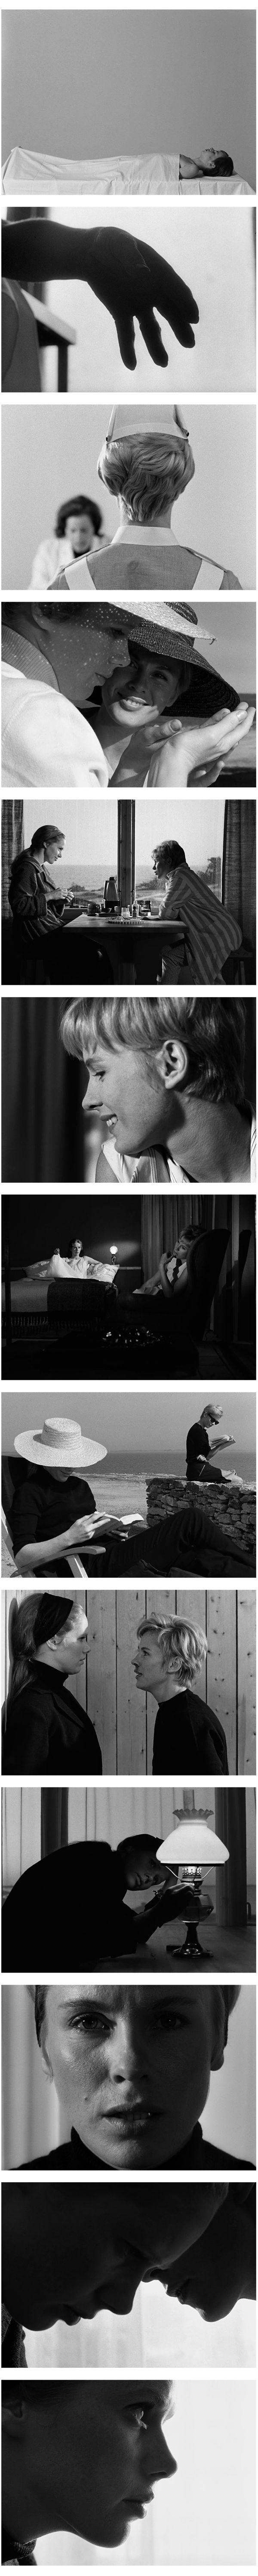 Persona (1966). Directed by Ingmar Bergman. Cinematography by Sven Nykvist.